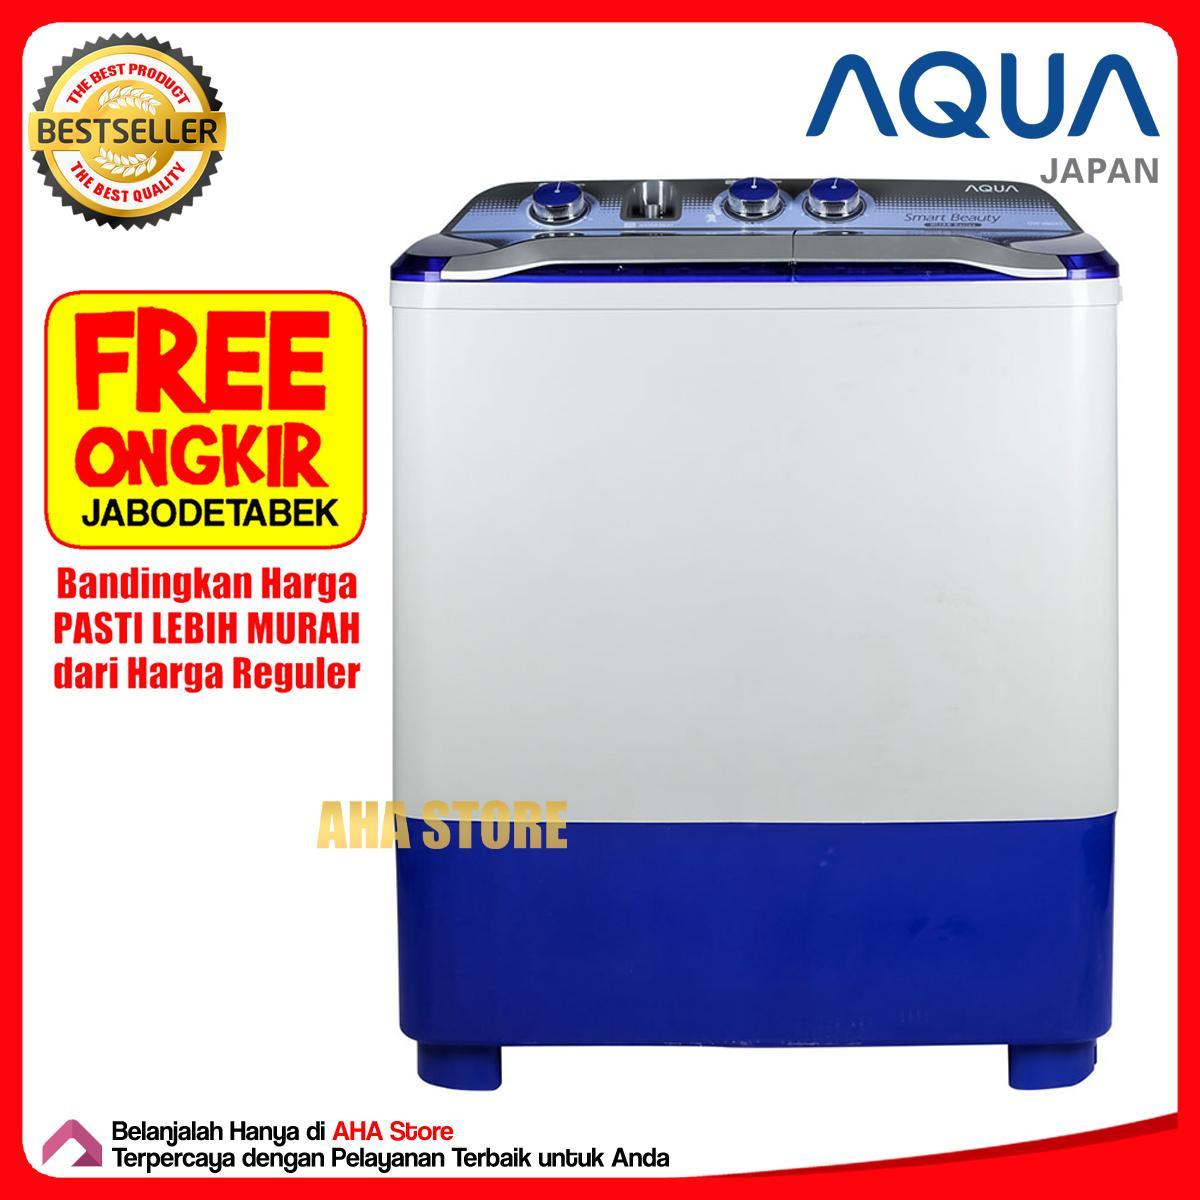 Aqua Mesin Cuci 2 Tabung 8 Kg QW-880XT (FREE ONGKIR JABODETABEK)